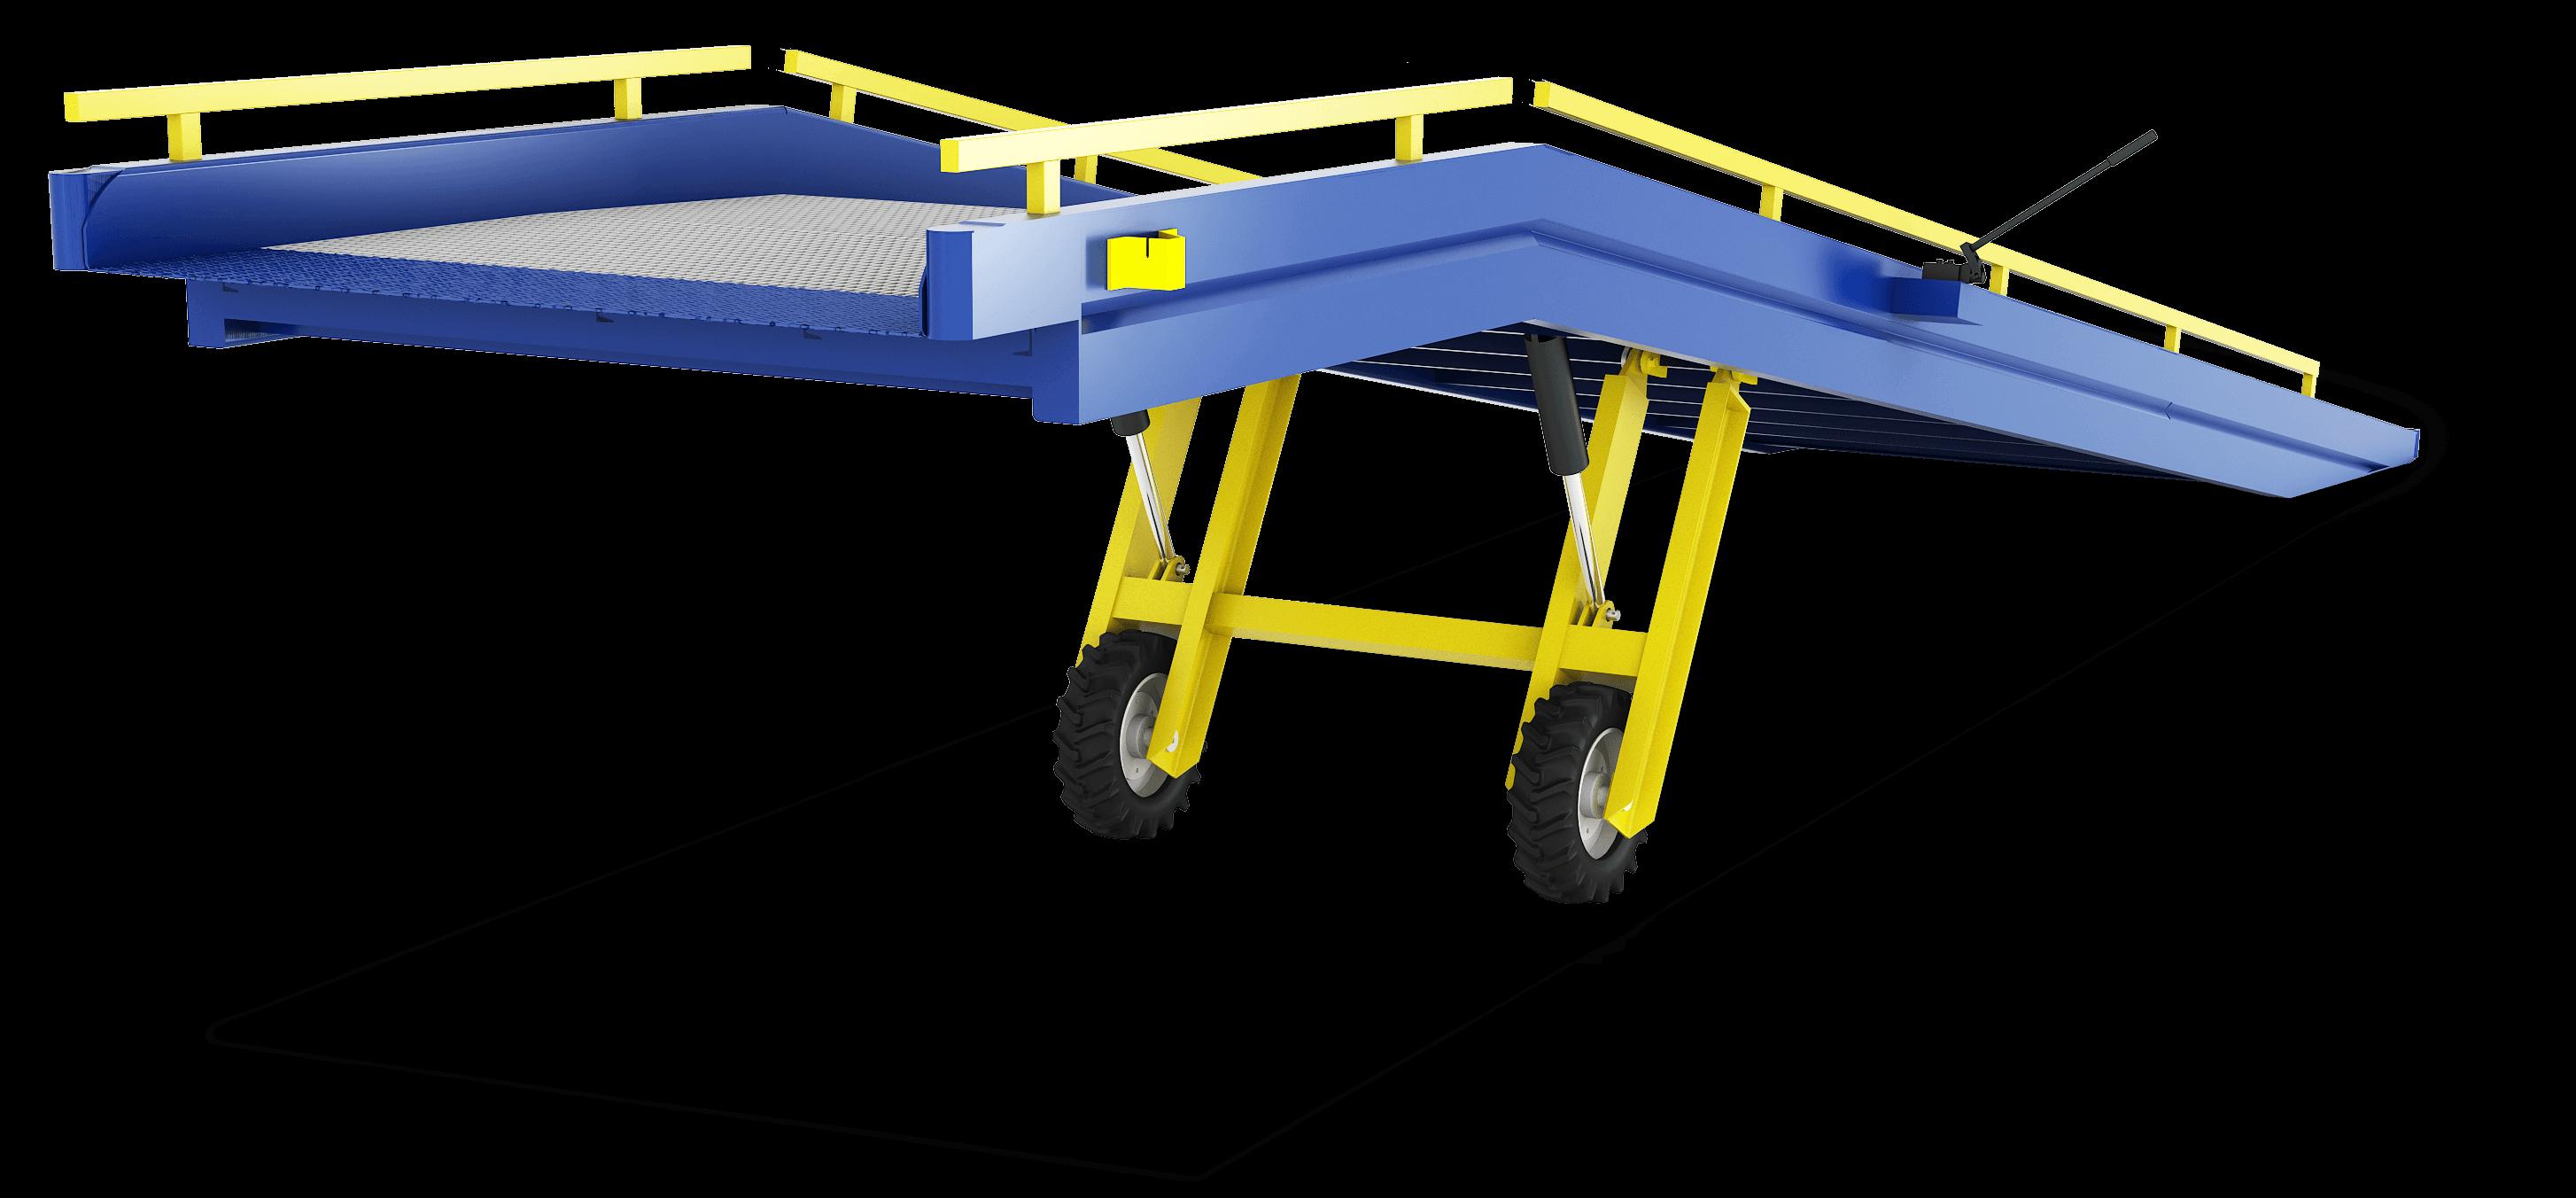 Fabrication D Escalier En Tunisie risel industries